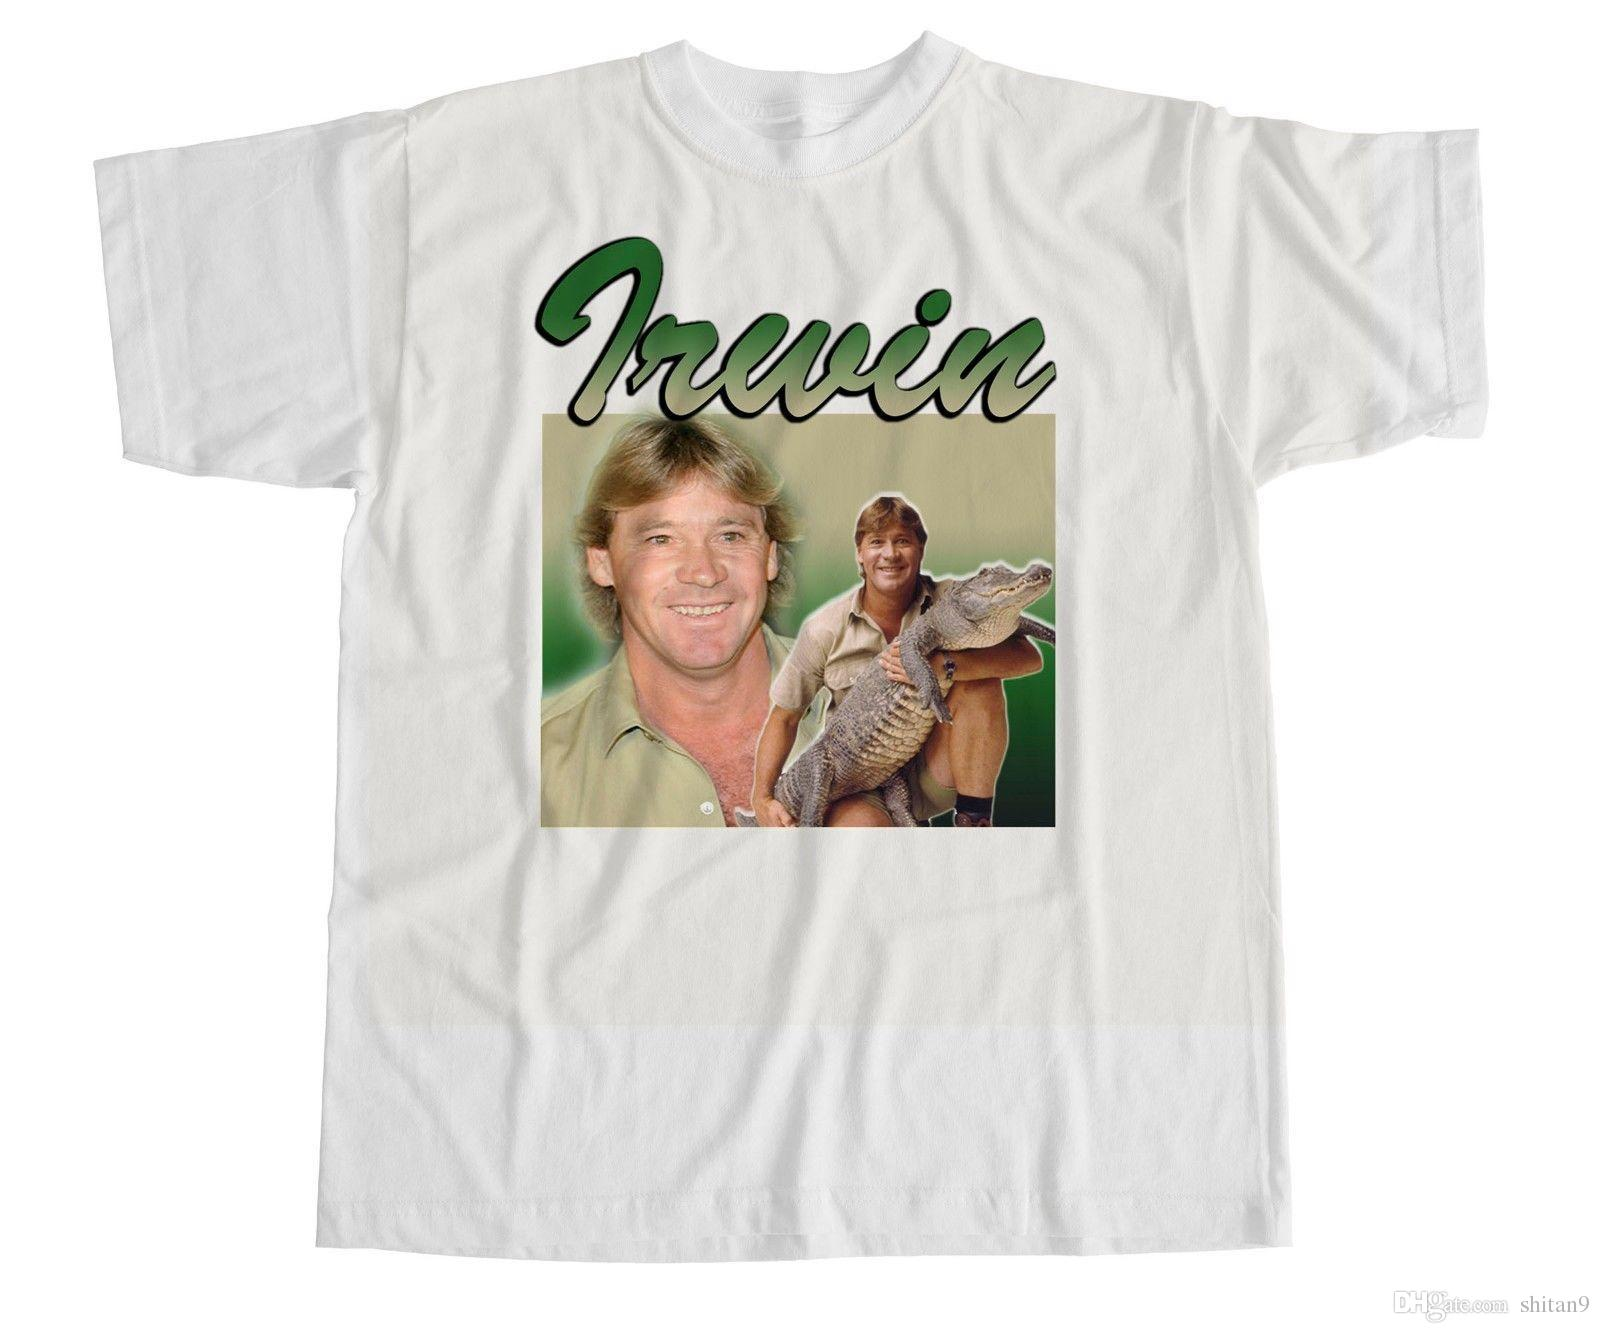 41426fc1a80 Steve Irwin T Shirt Crocodile Hunter Australia Homage Vintage Celebrity  Crikey New 2018 Summer Style T Shirt A T Shirts Fun T Shirts Online From  Shitan9